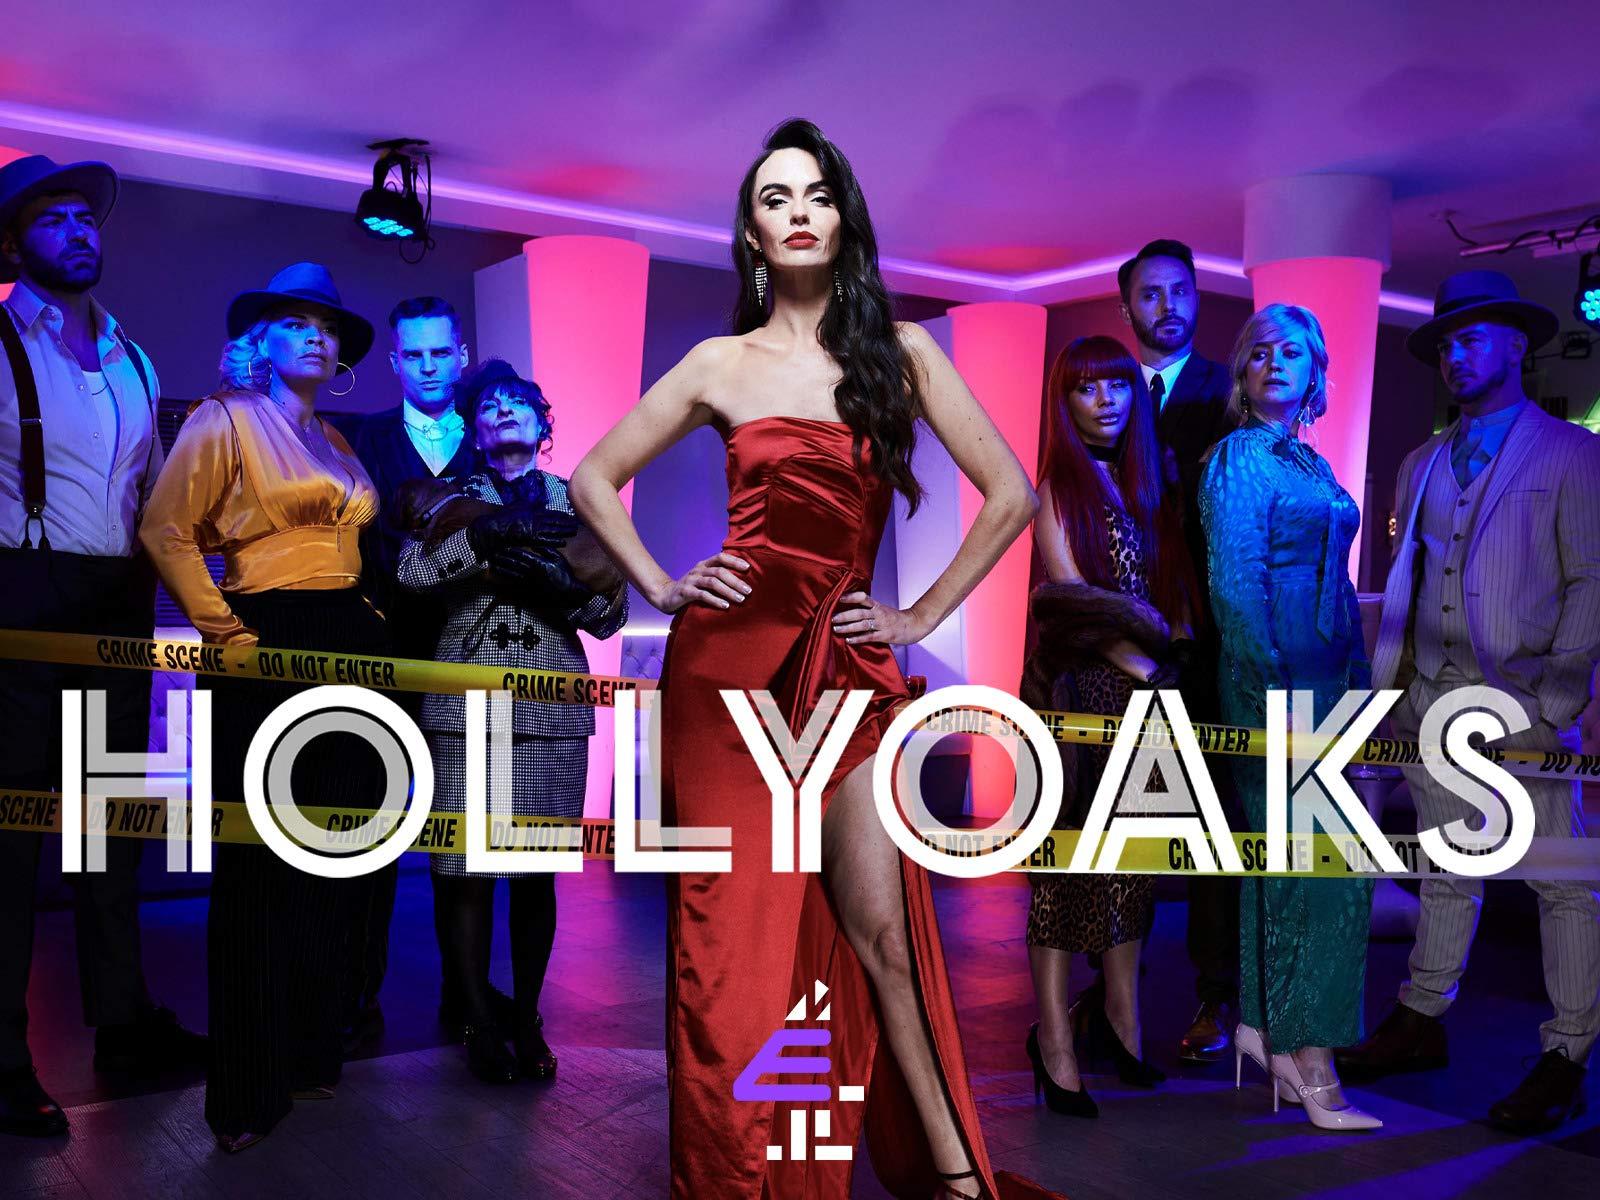 Hollyoaks Omnibus on Amazon Prime Video UK